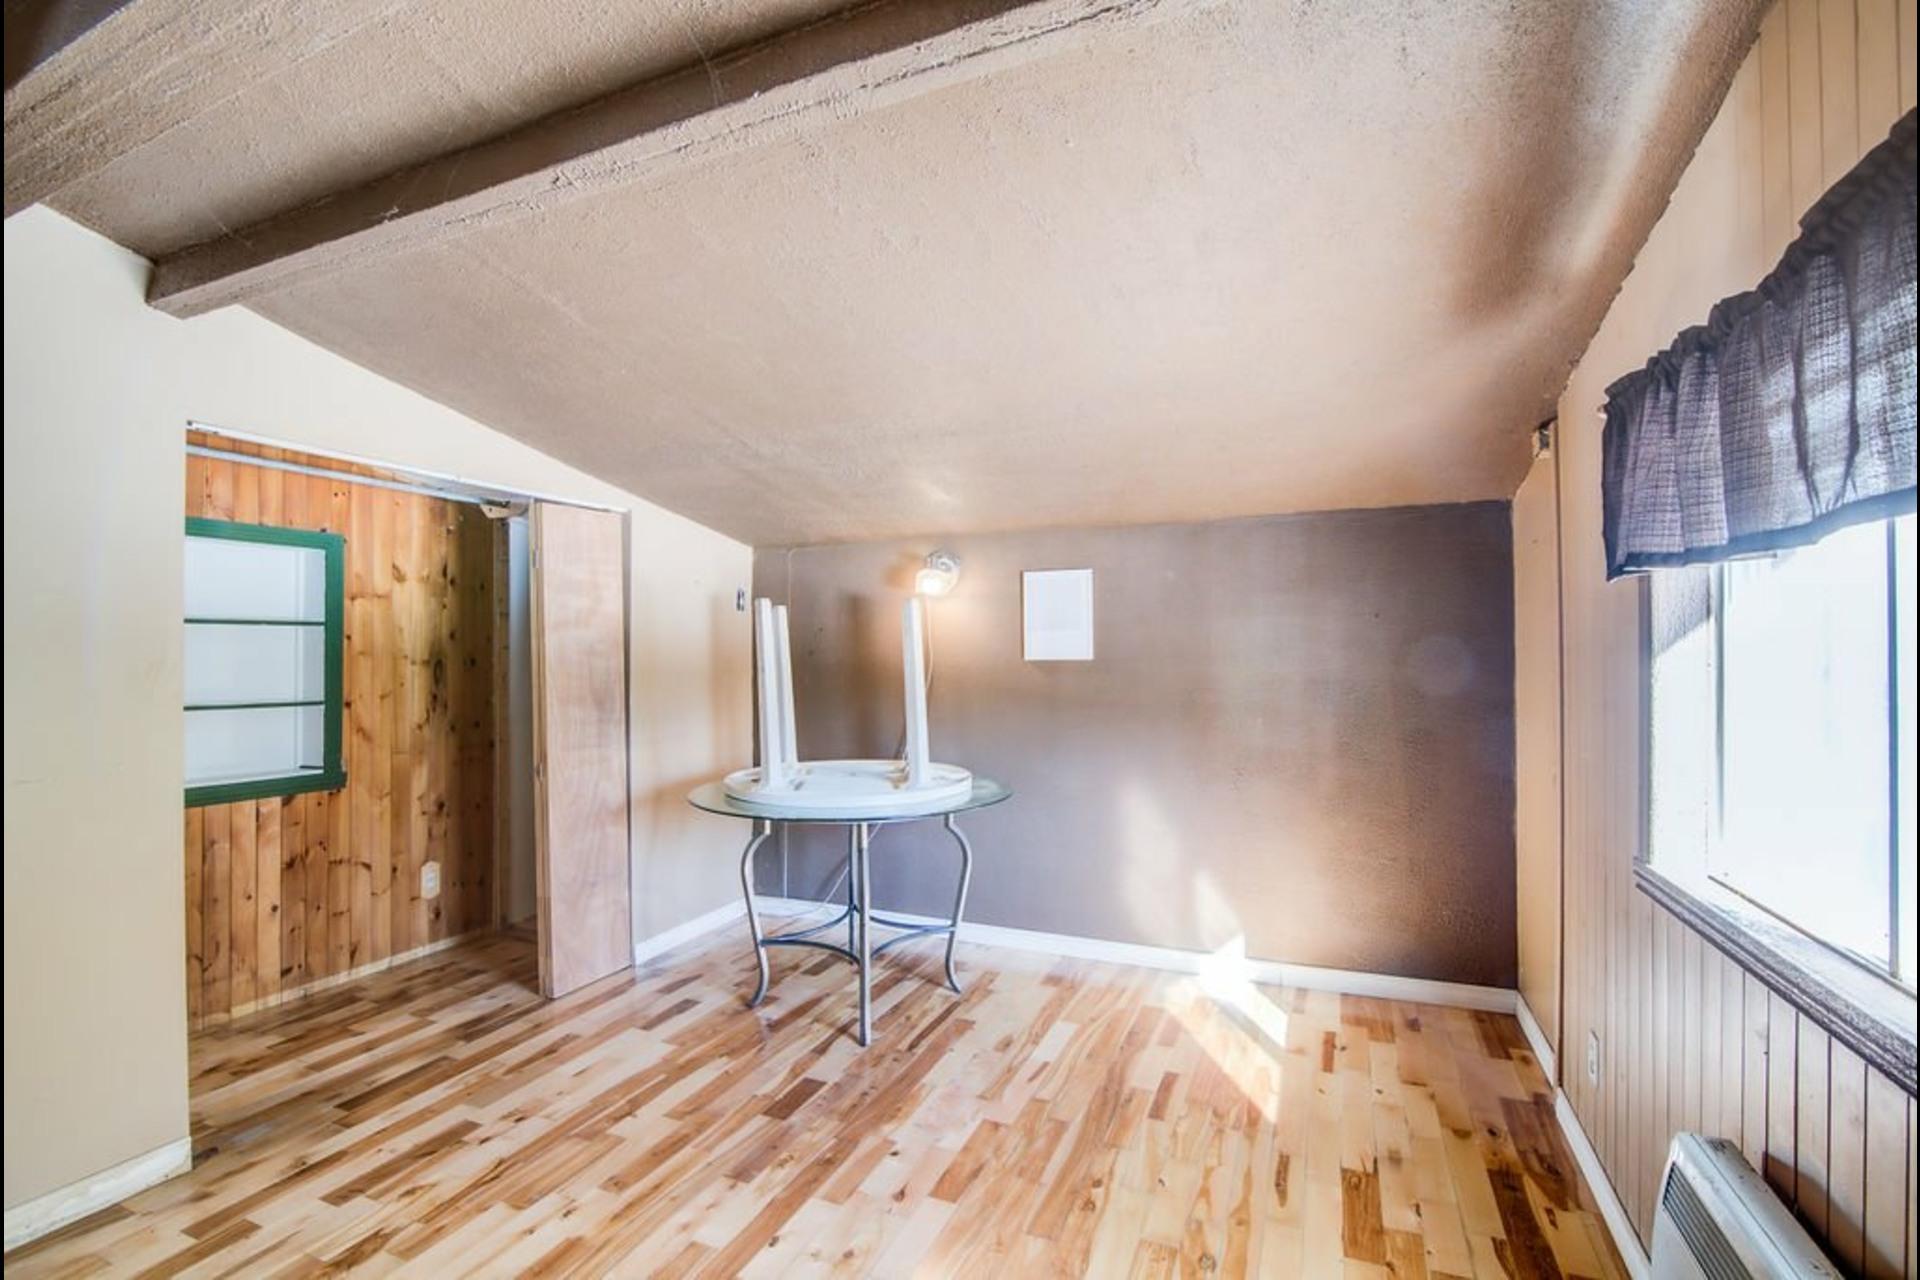 image 16 - House For sale Saint-Calixte - 8 rooms